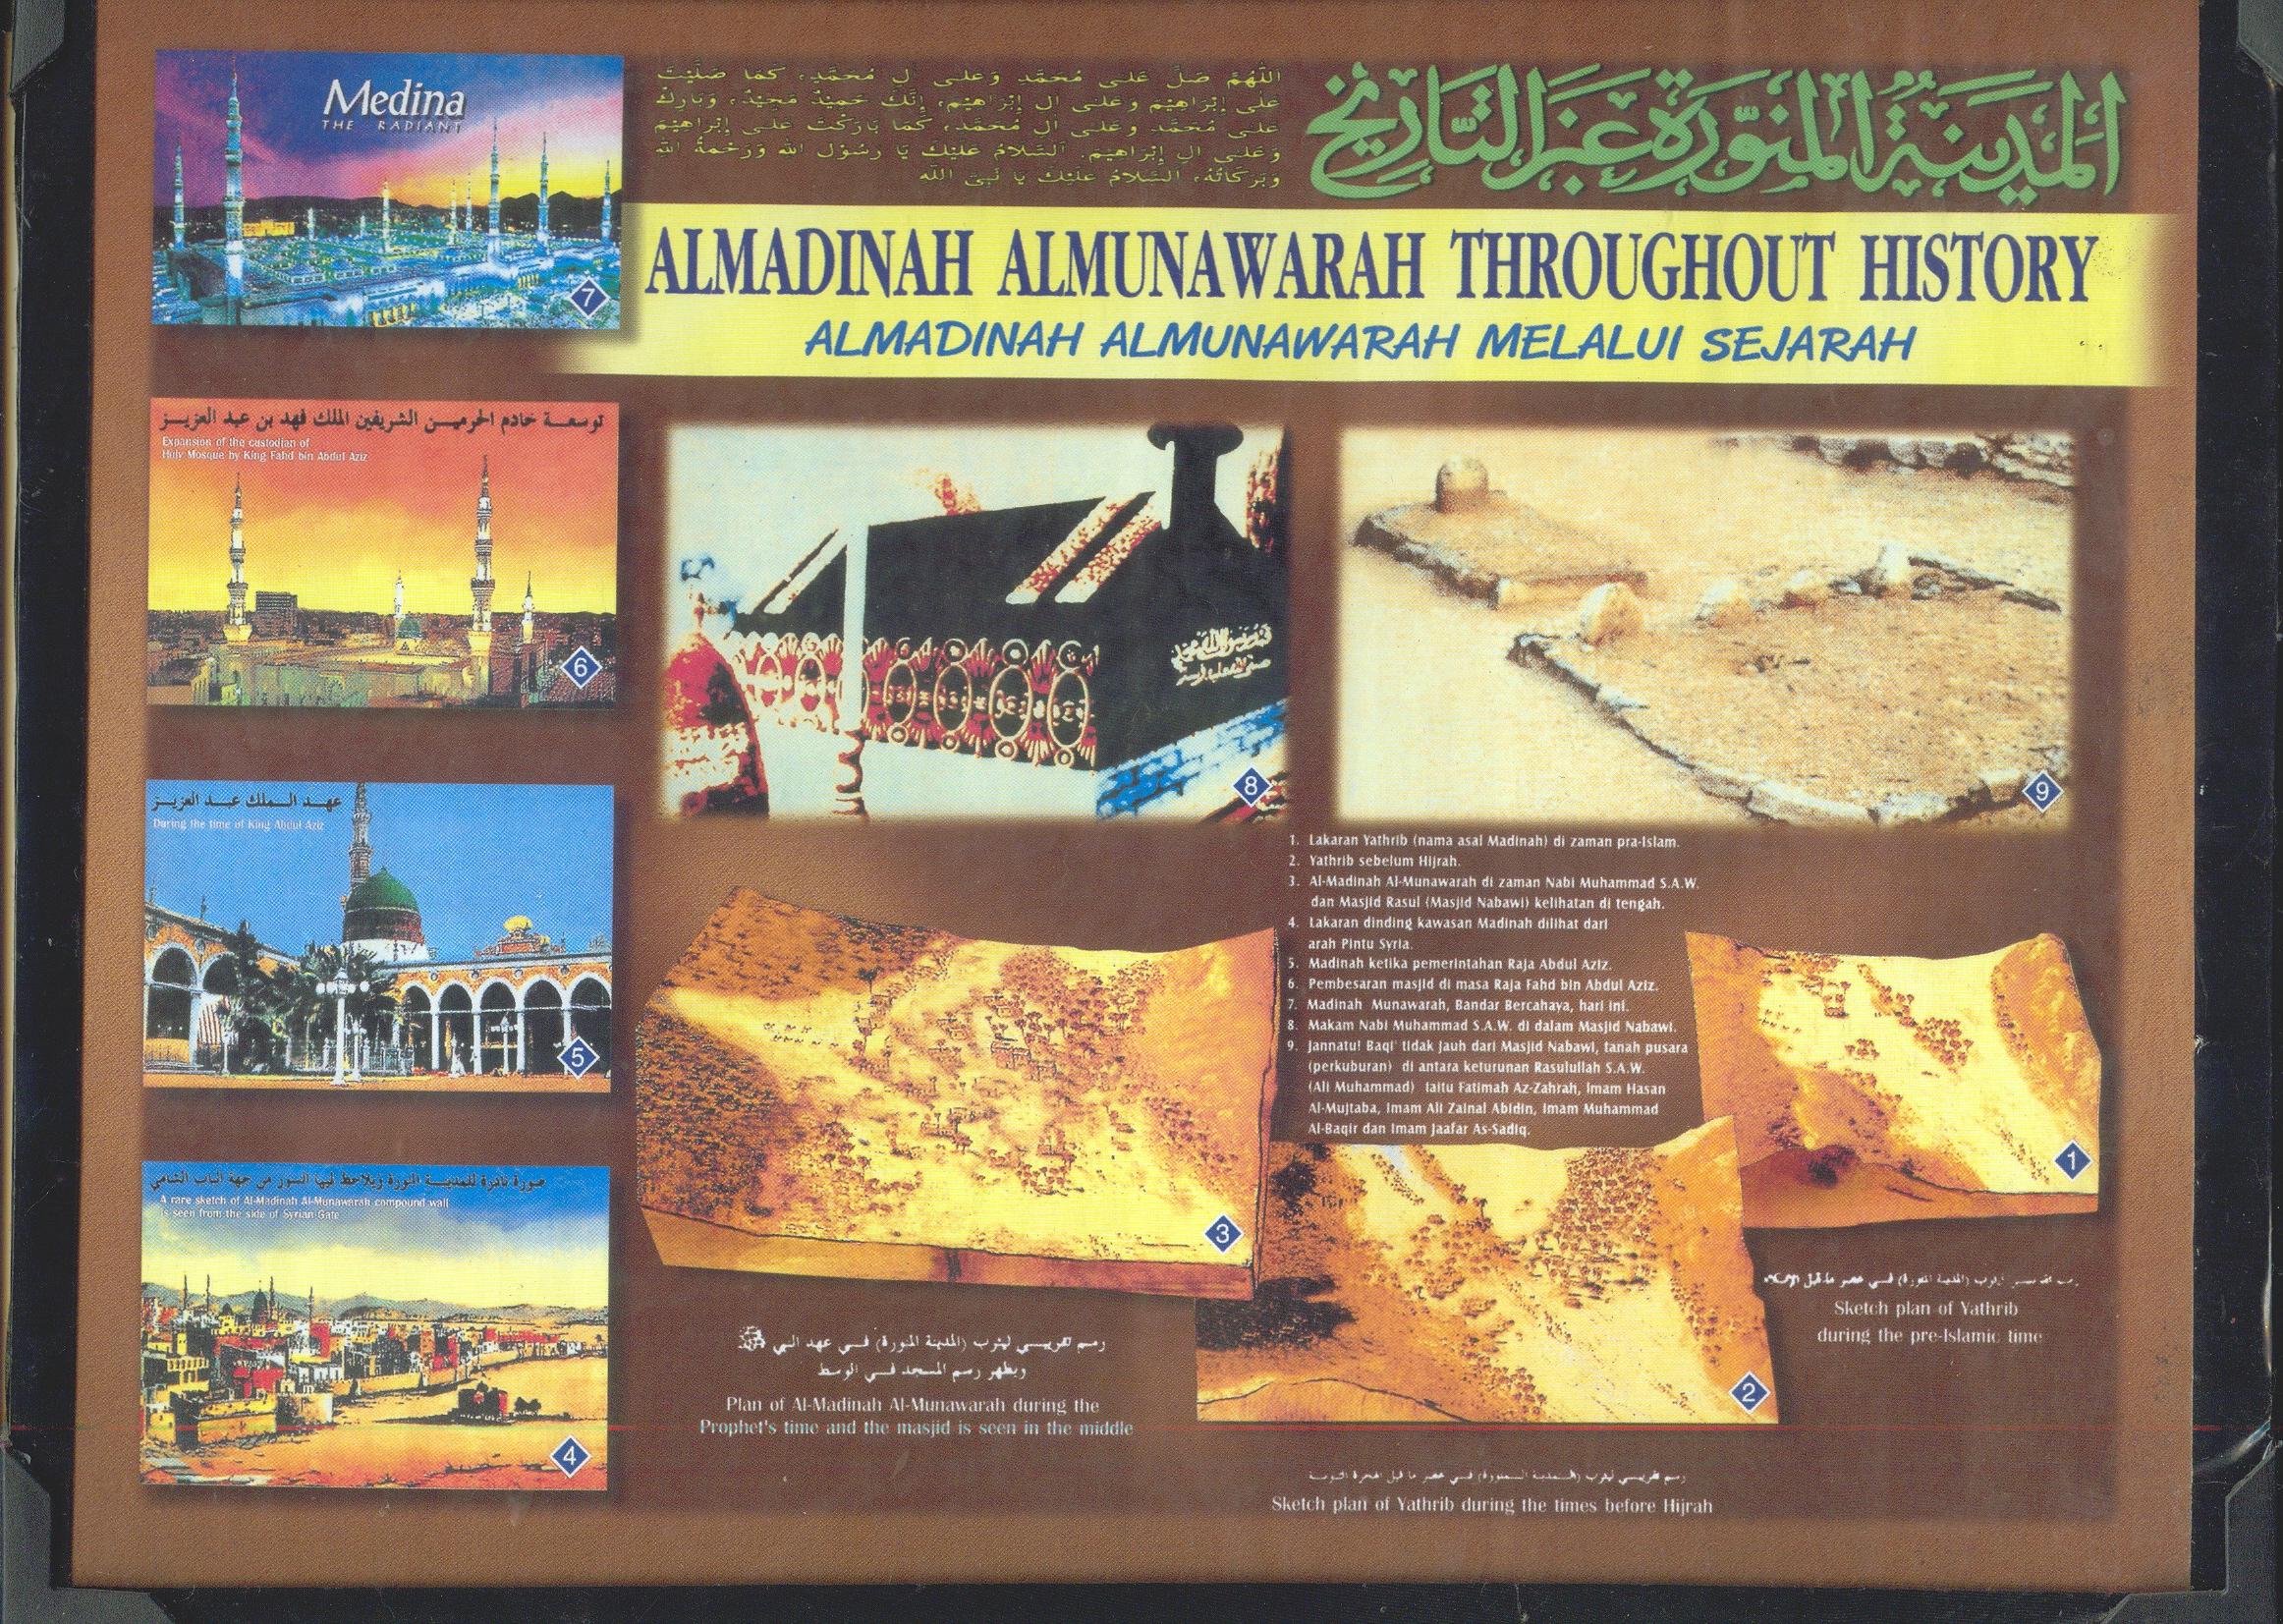 Almadinah almunawarah throghout history-a1-jpg